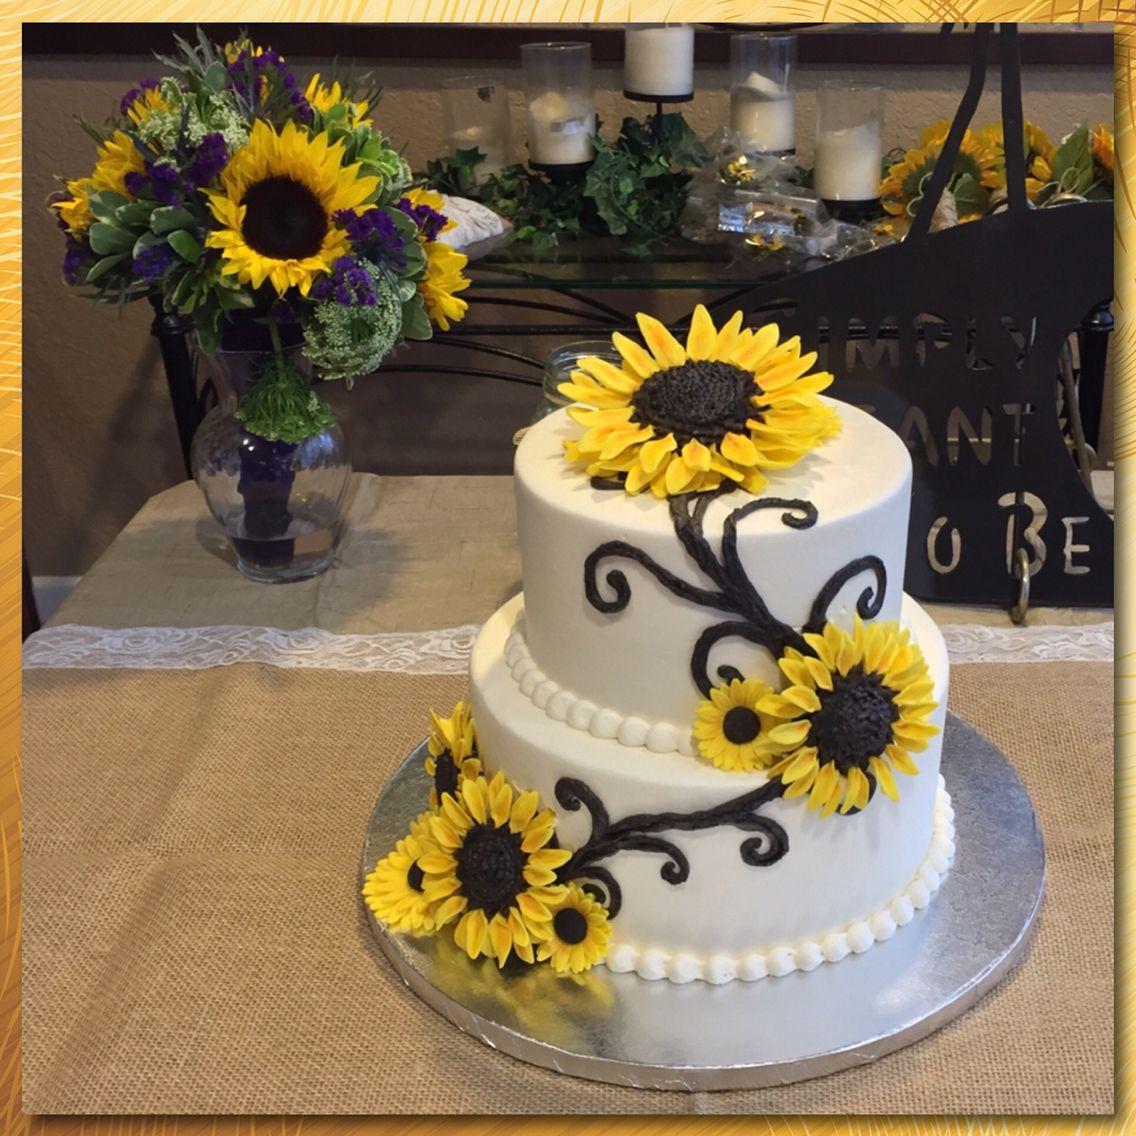 A sunflower themed wedding cake ) Themed wedding cakes